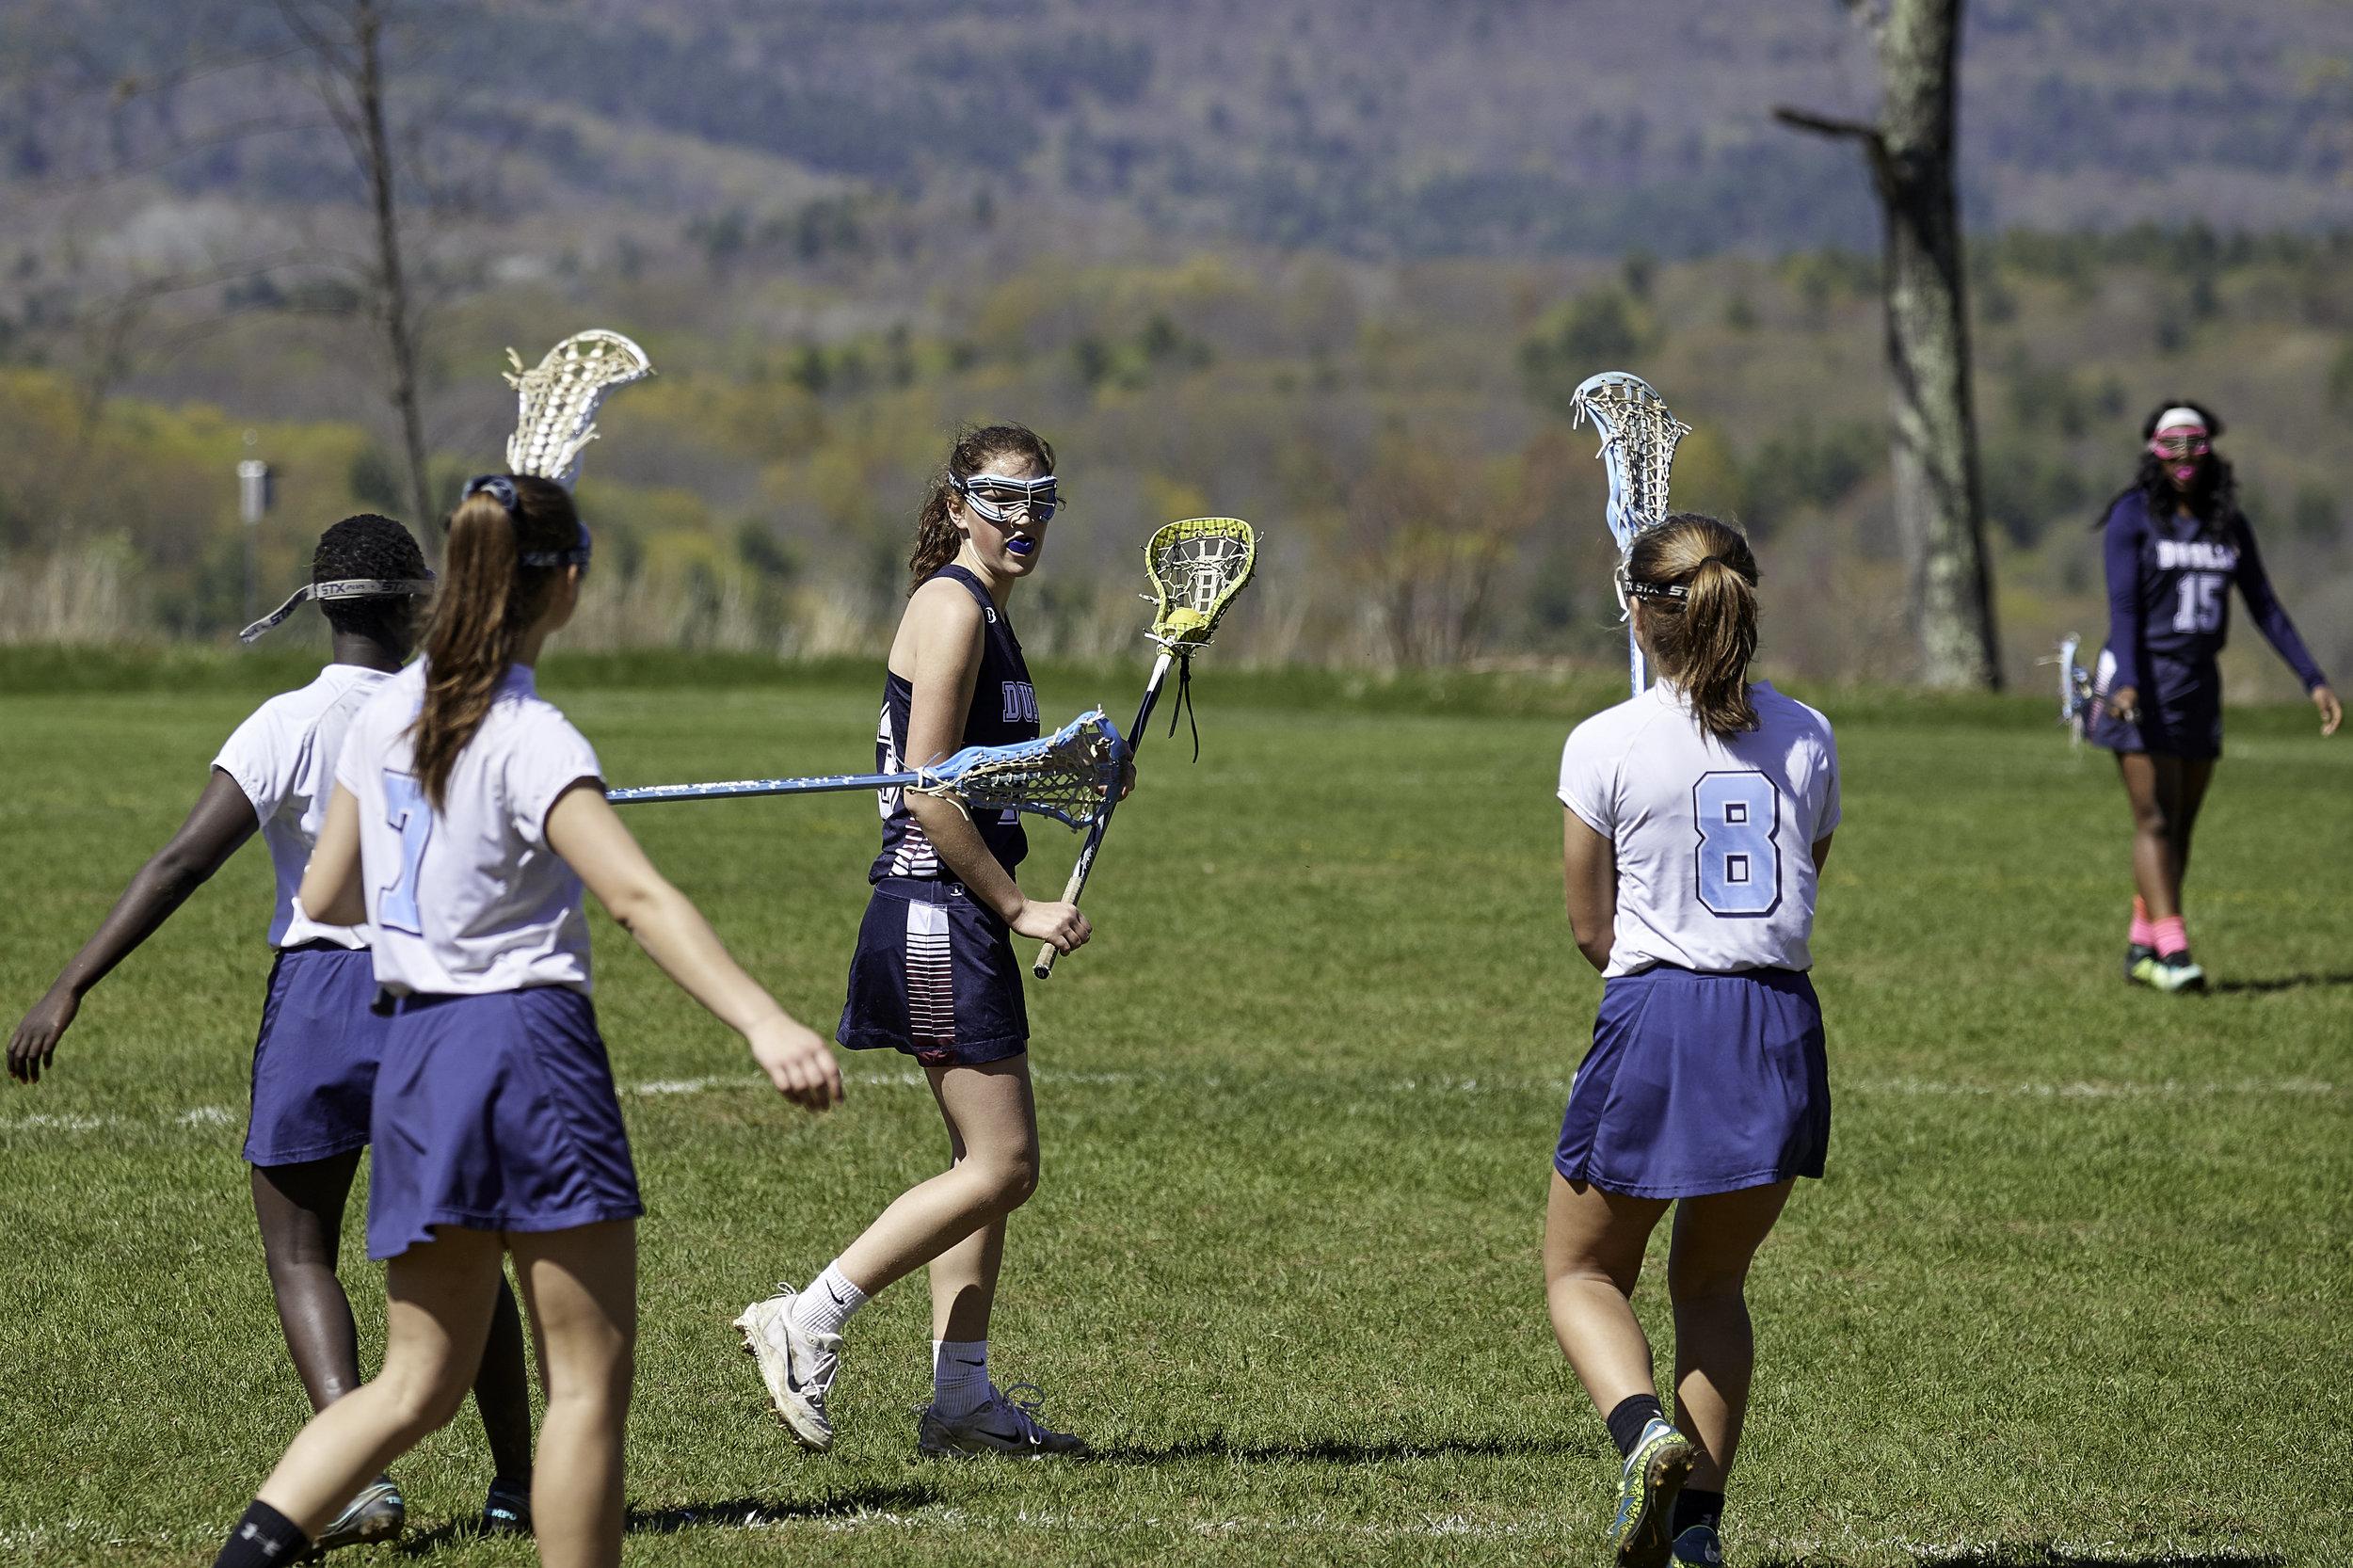 Girls Lacrosse vs. Stoneleigh Burnham School - May 11, 2019 - May 10, 2019193388.jpg